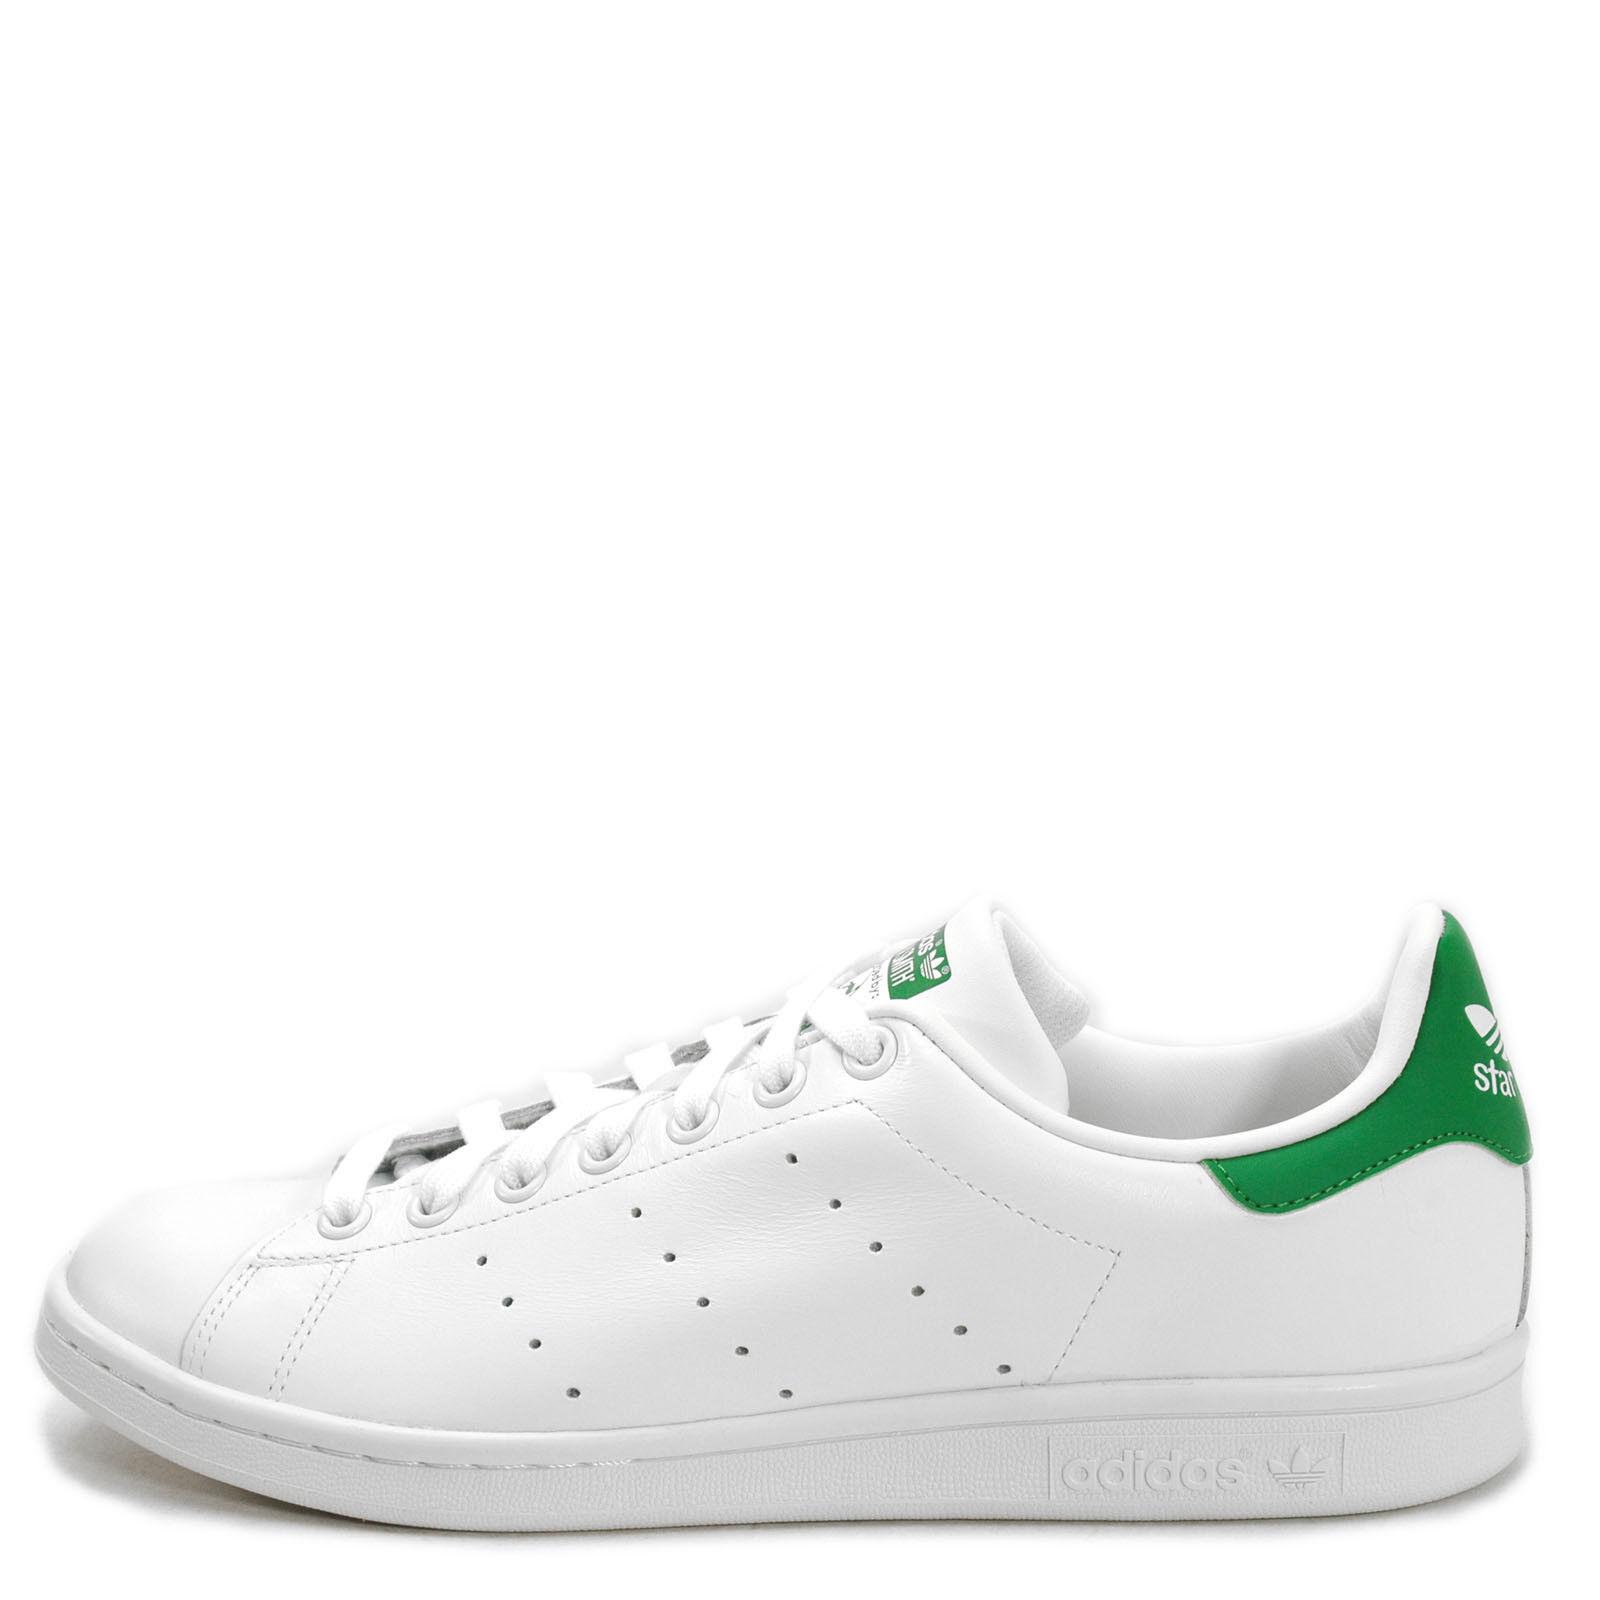 Adidas Originals Stan Smith [M20324] Chaussures de sport pour homme Blanc / Fairway